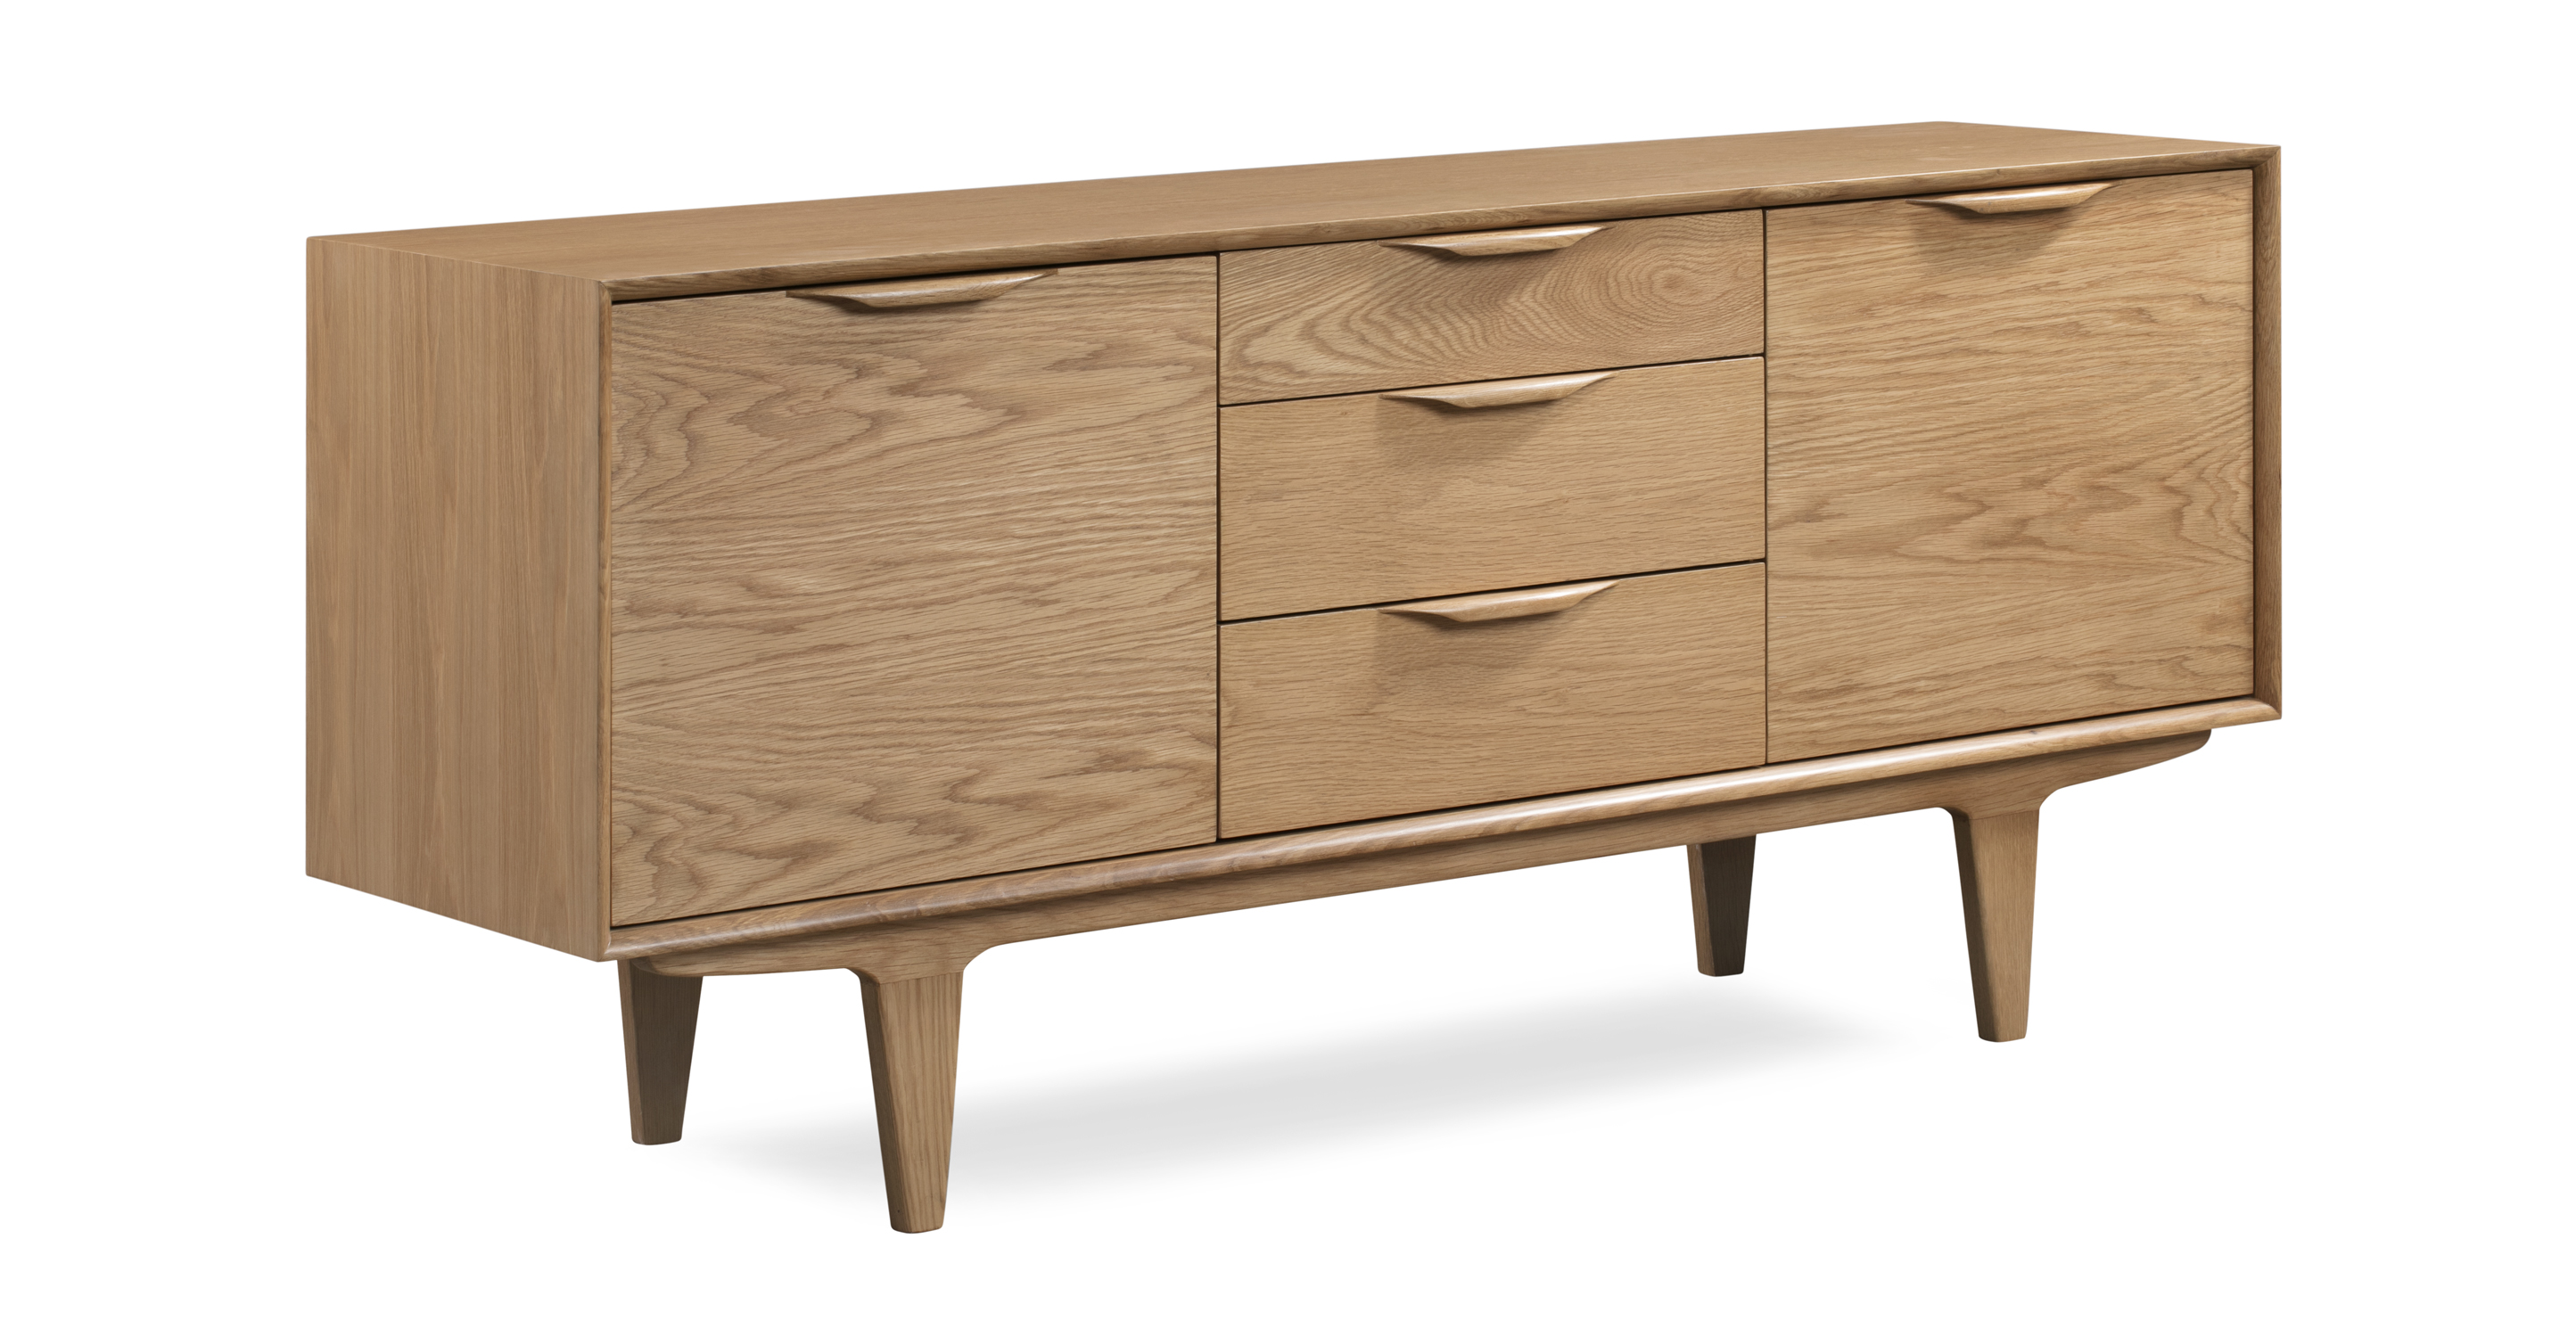 "Rolluk 68"" Sideboard, Natural Oak"